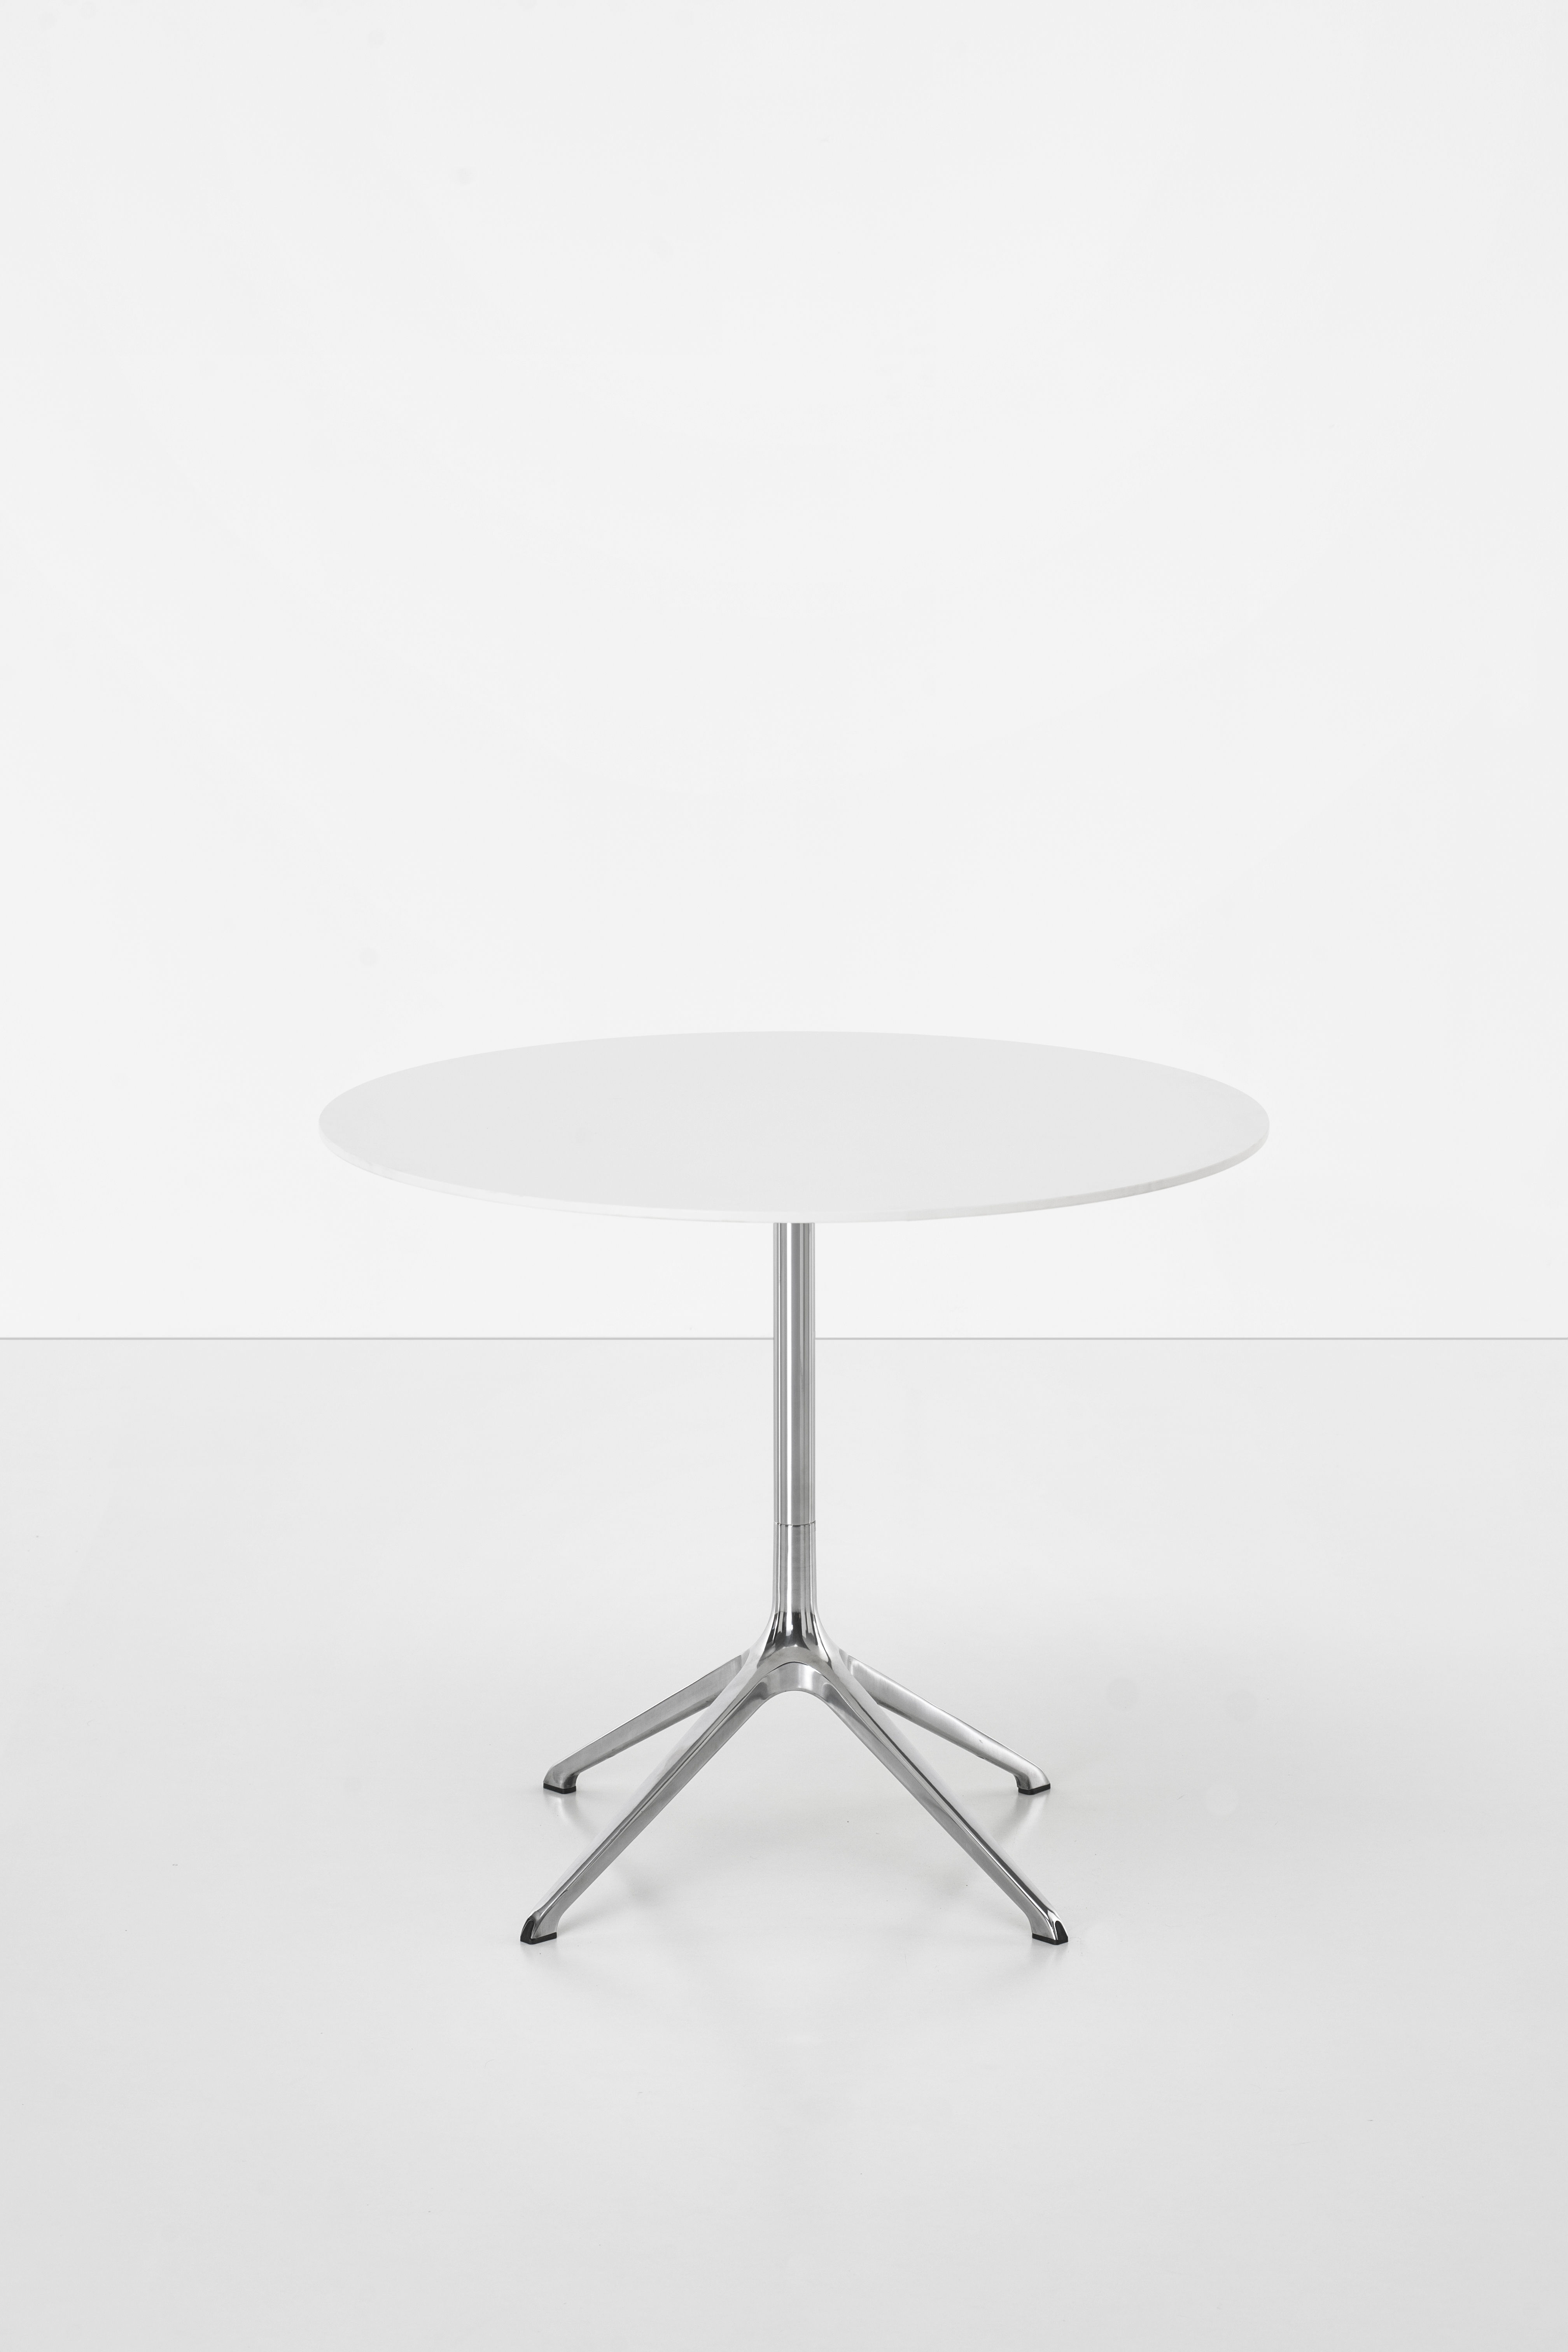 table elfin indoor 90 cm blanc pied alu poli made in design editions by designfit. Black Bedroom Furniture Sets. Home Design Ideas